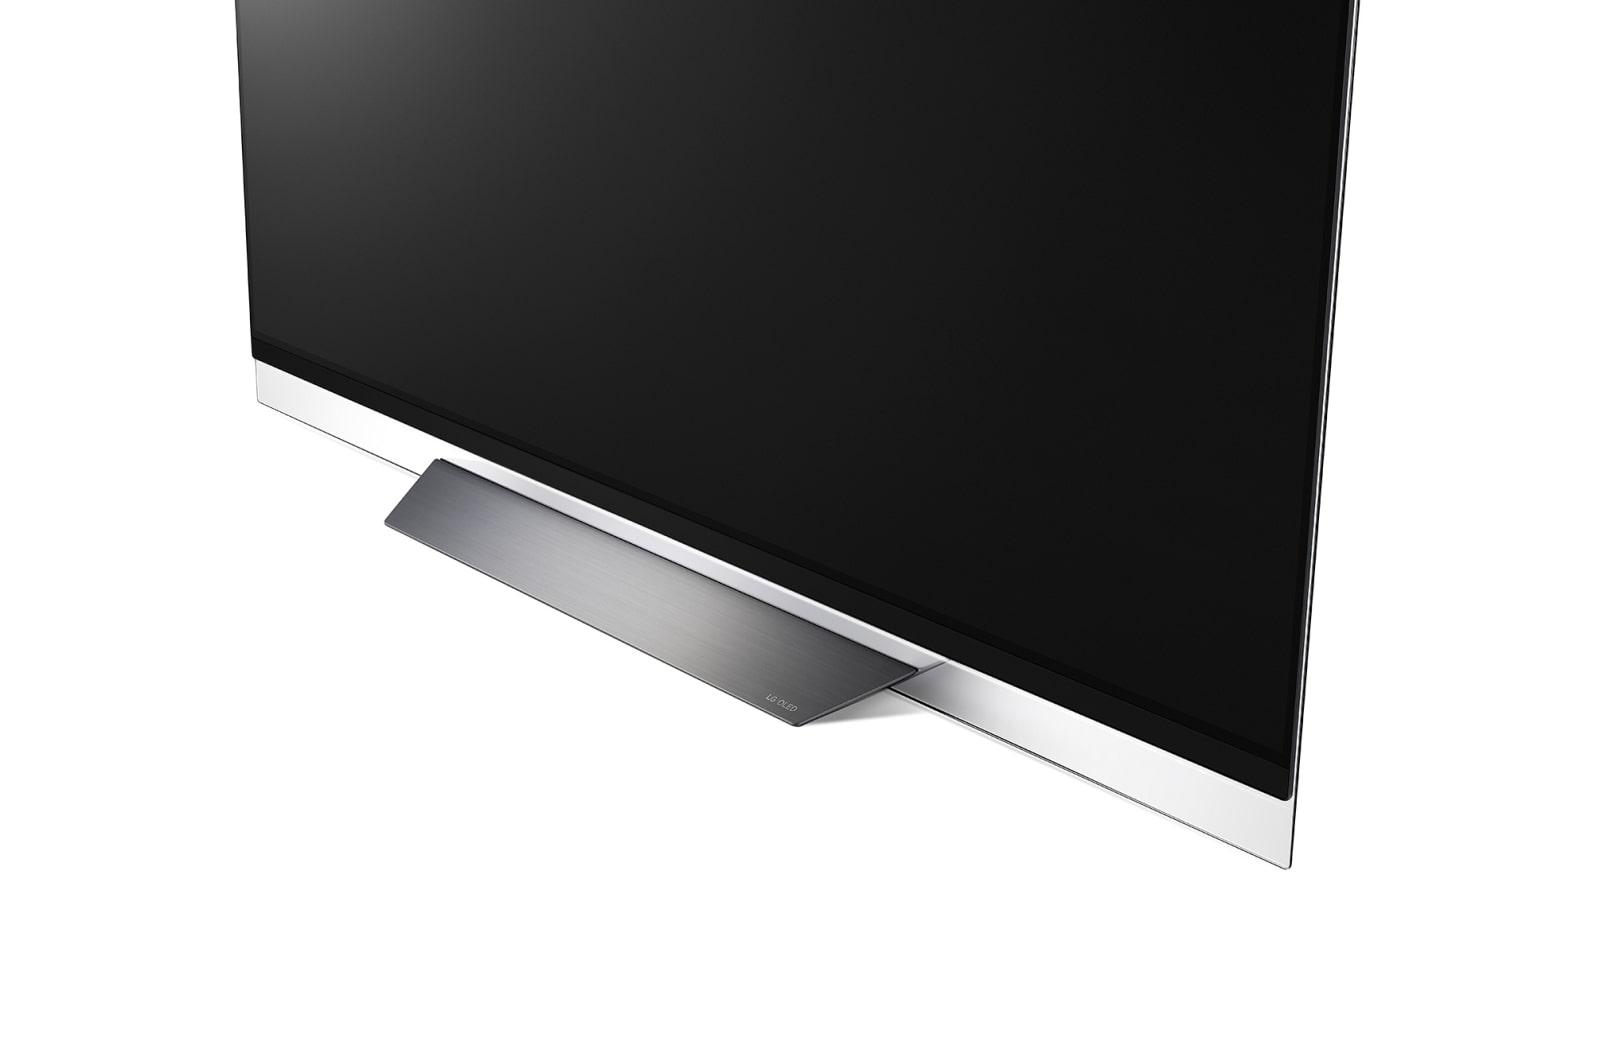 e8ba6b7b4 LG 65 LG OLED TV, webOS Smart TV | LG Slovenská republika